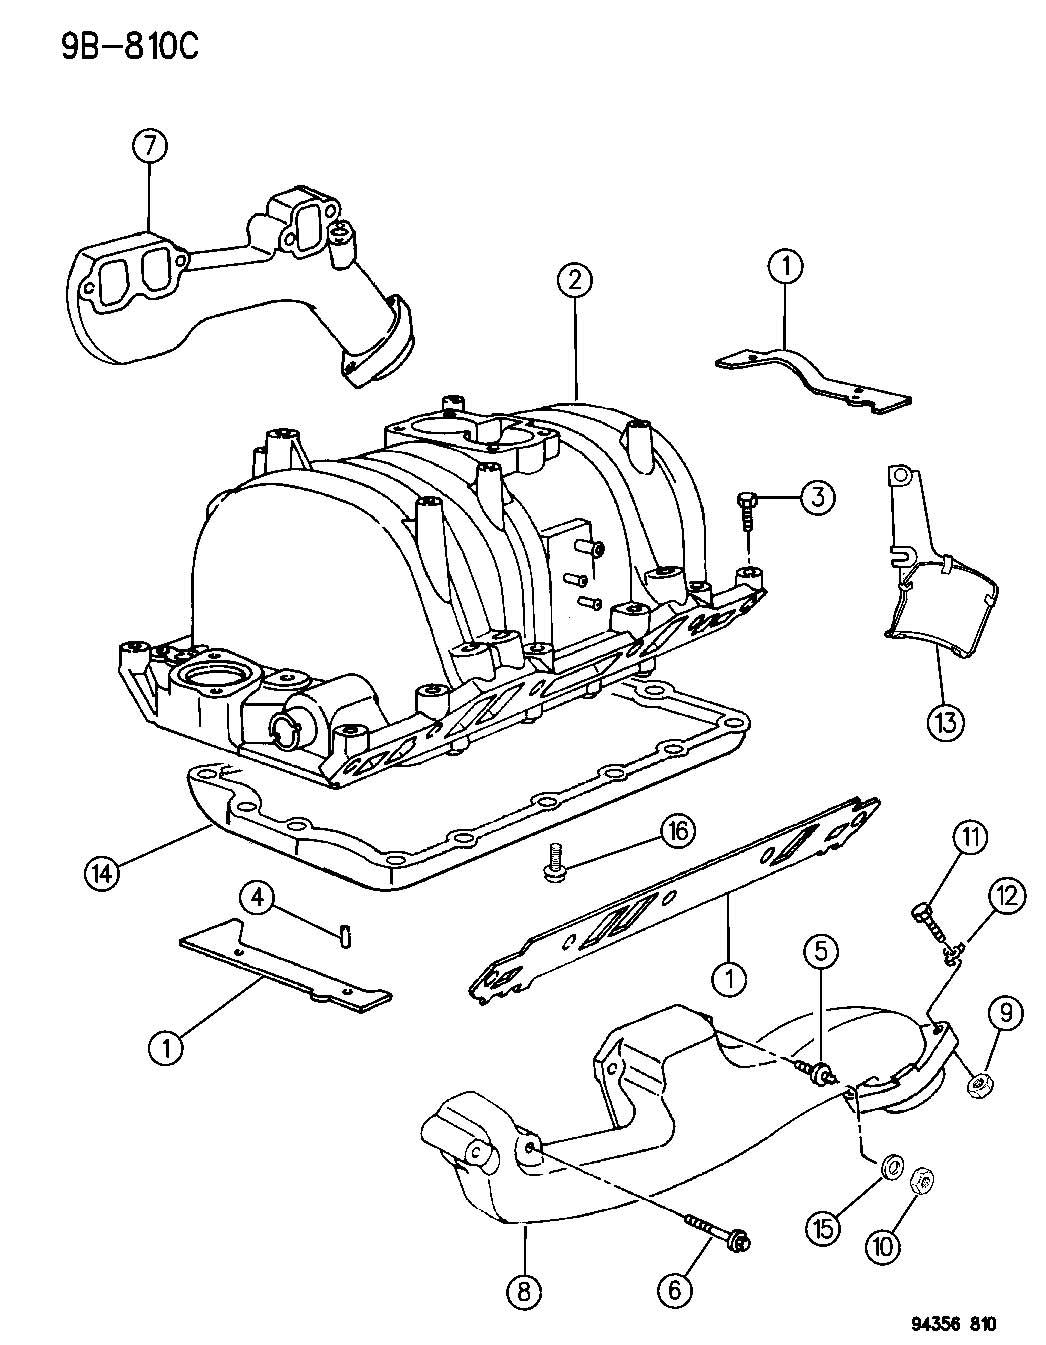 Dodge Dakota Manifold Intake And Exhaust 3 9l Engine